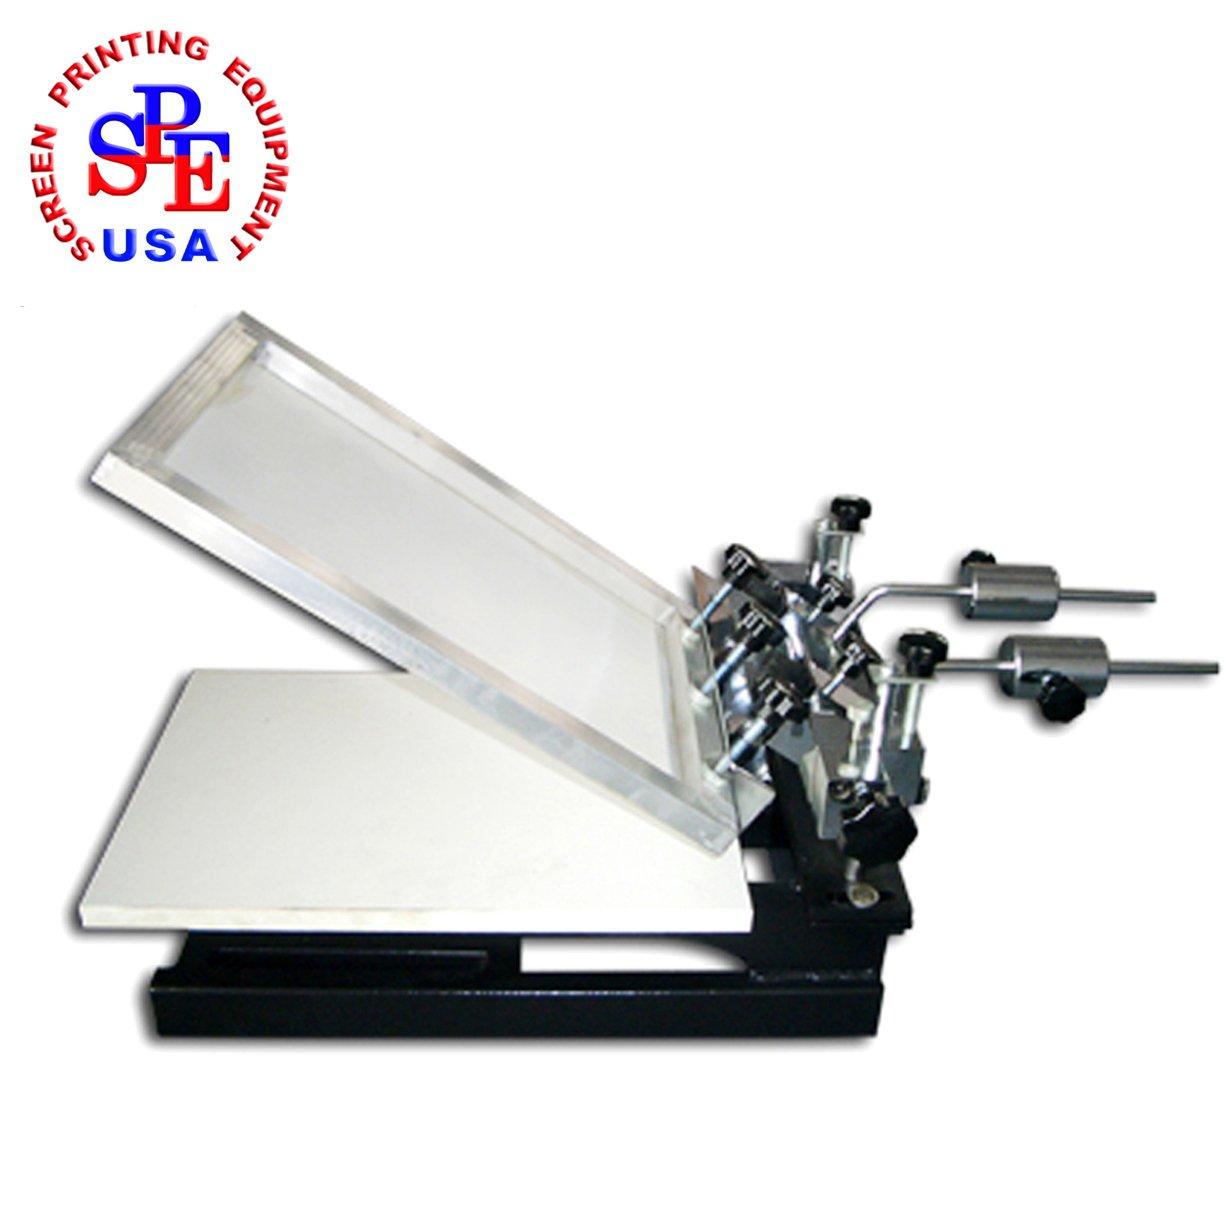 "1-1 Micro-adjustable Screen Printing Machine Silk Screen Printer with 3 Adjustable Pallets 23.6""x17.7"" (60x45cm) 17.3''X12.6''(44x32cm) 11.8""x9.4"" (30x24cm) by Screen Printing Machine Series"